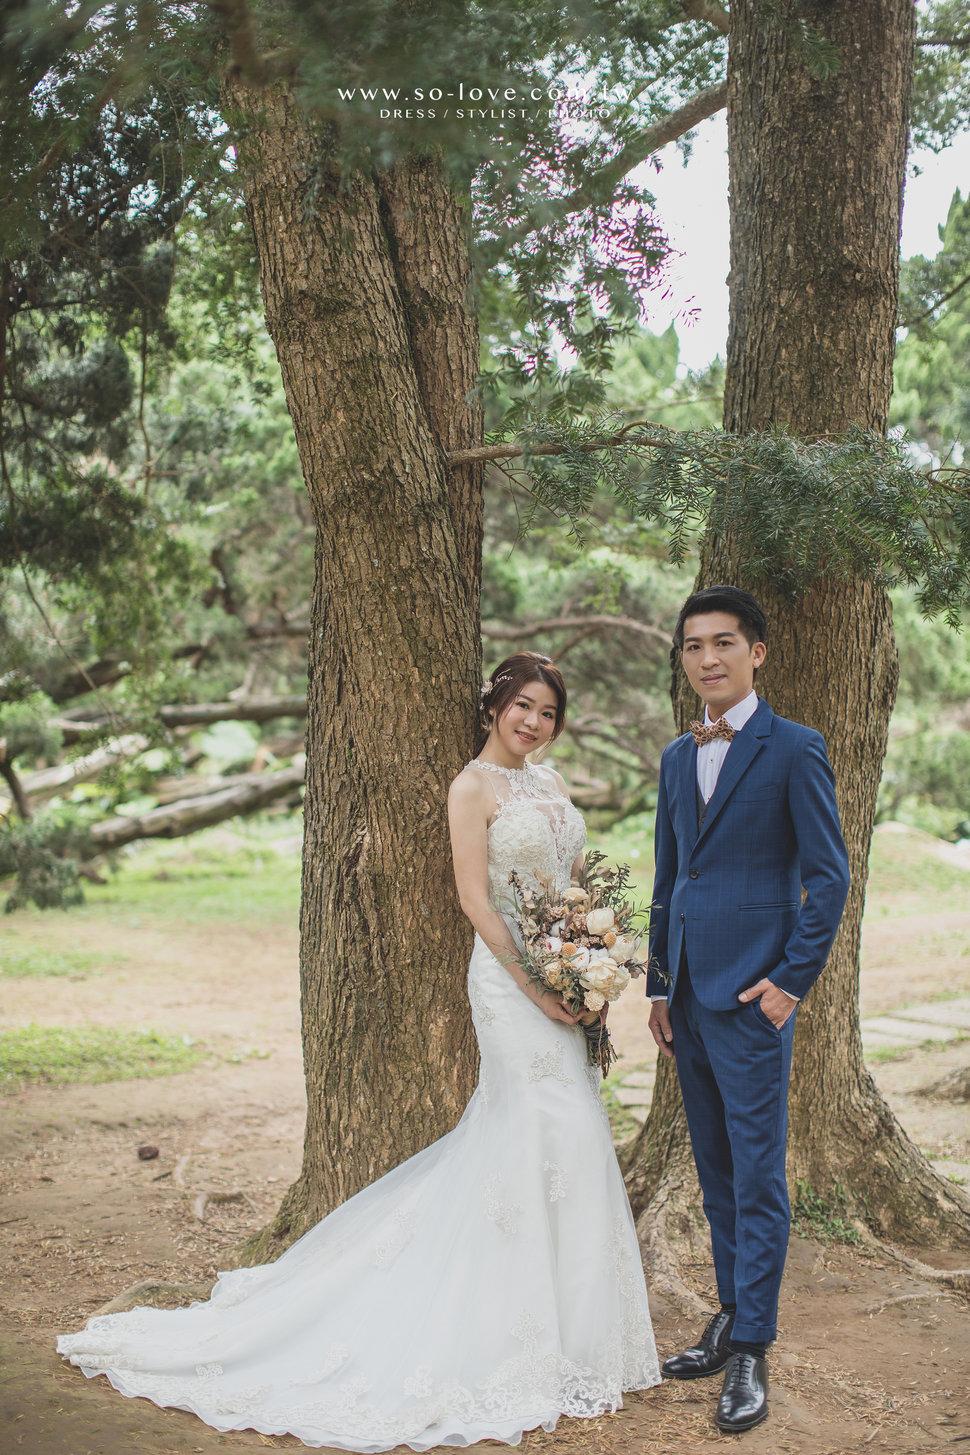 RYAN8114 - So.Love Wedding 樂樂蕾絲《結婚吧》